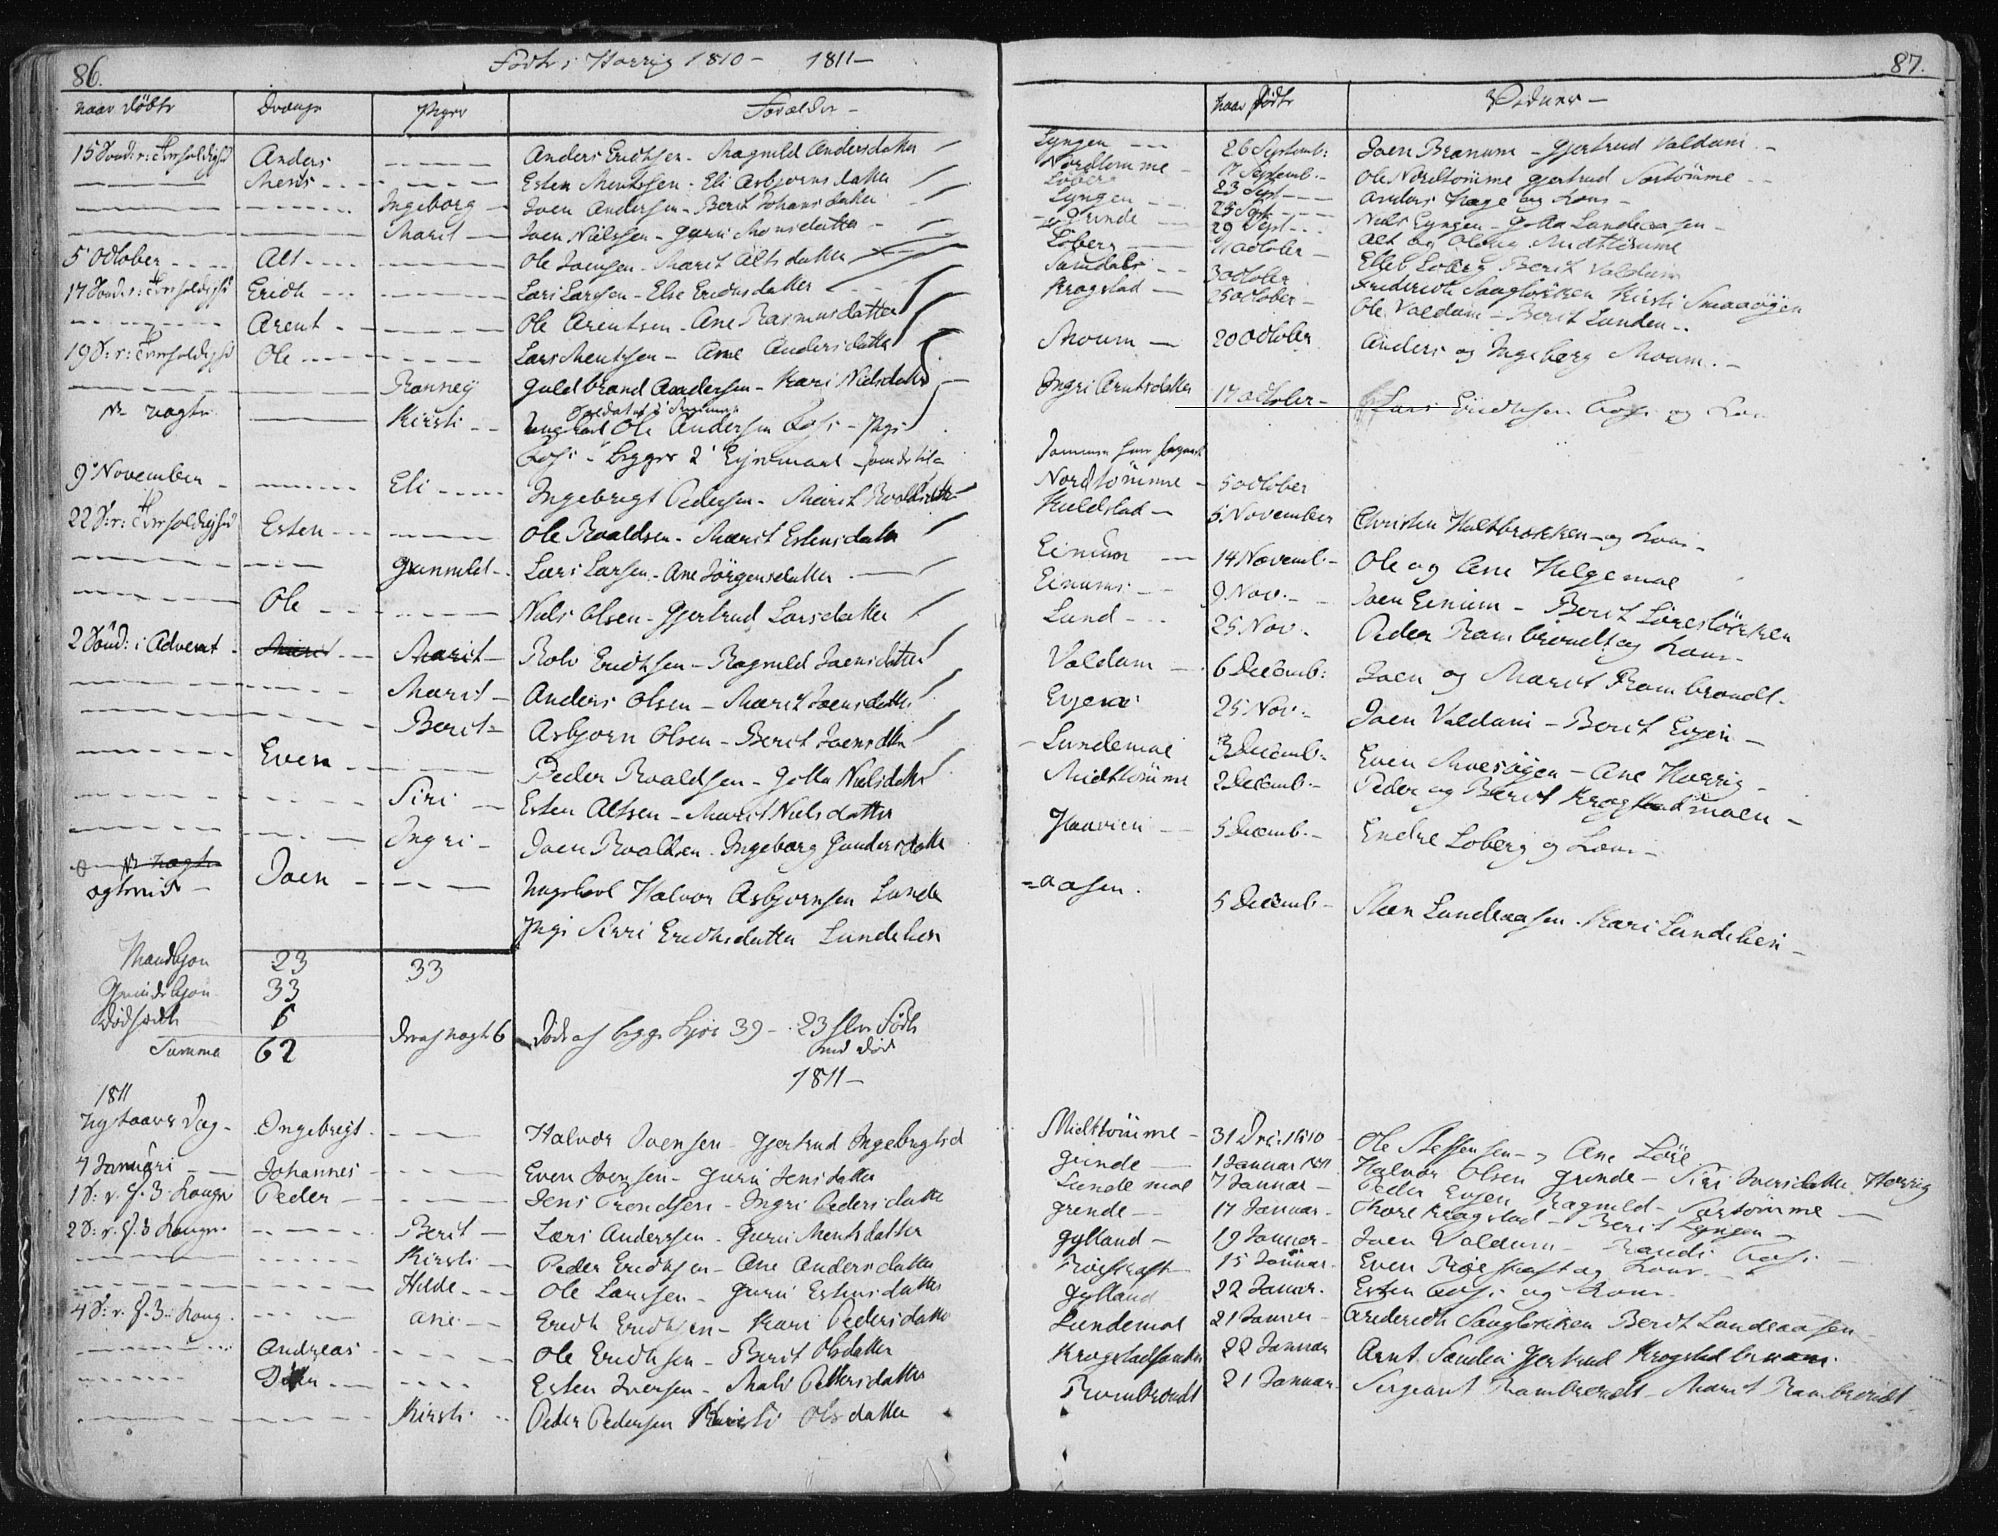 SAT, Ministerialprotokoller, klokkerbøker og fødselsregistre - Sør-Trøndelag, 687/L0993: Parish register (official) no. 687A03 /2, 1788-1815, p. 86-87